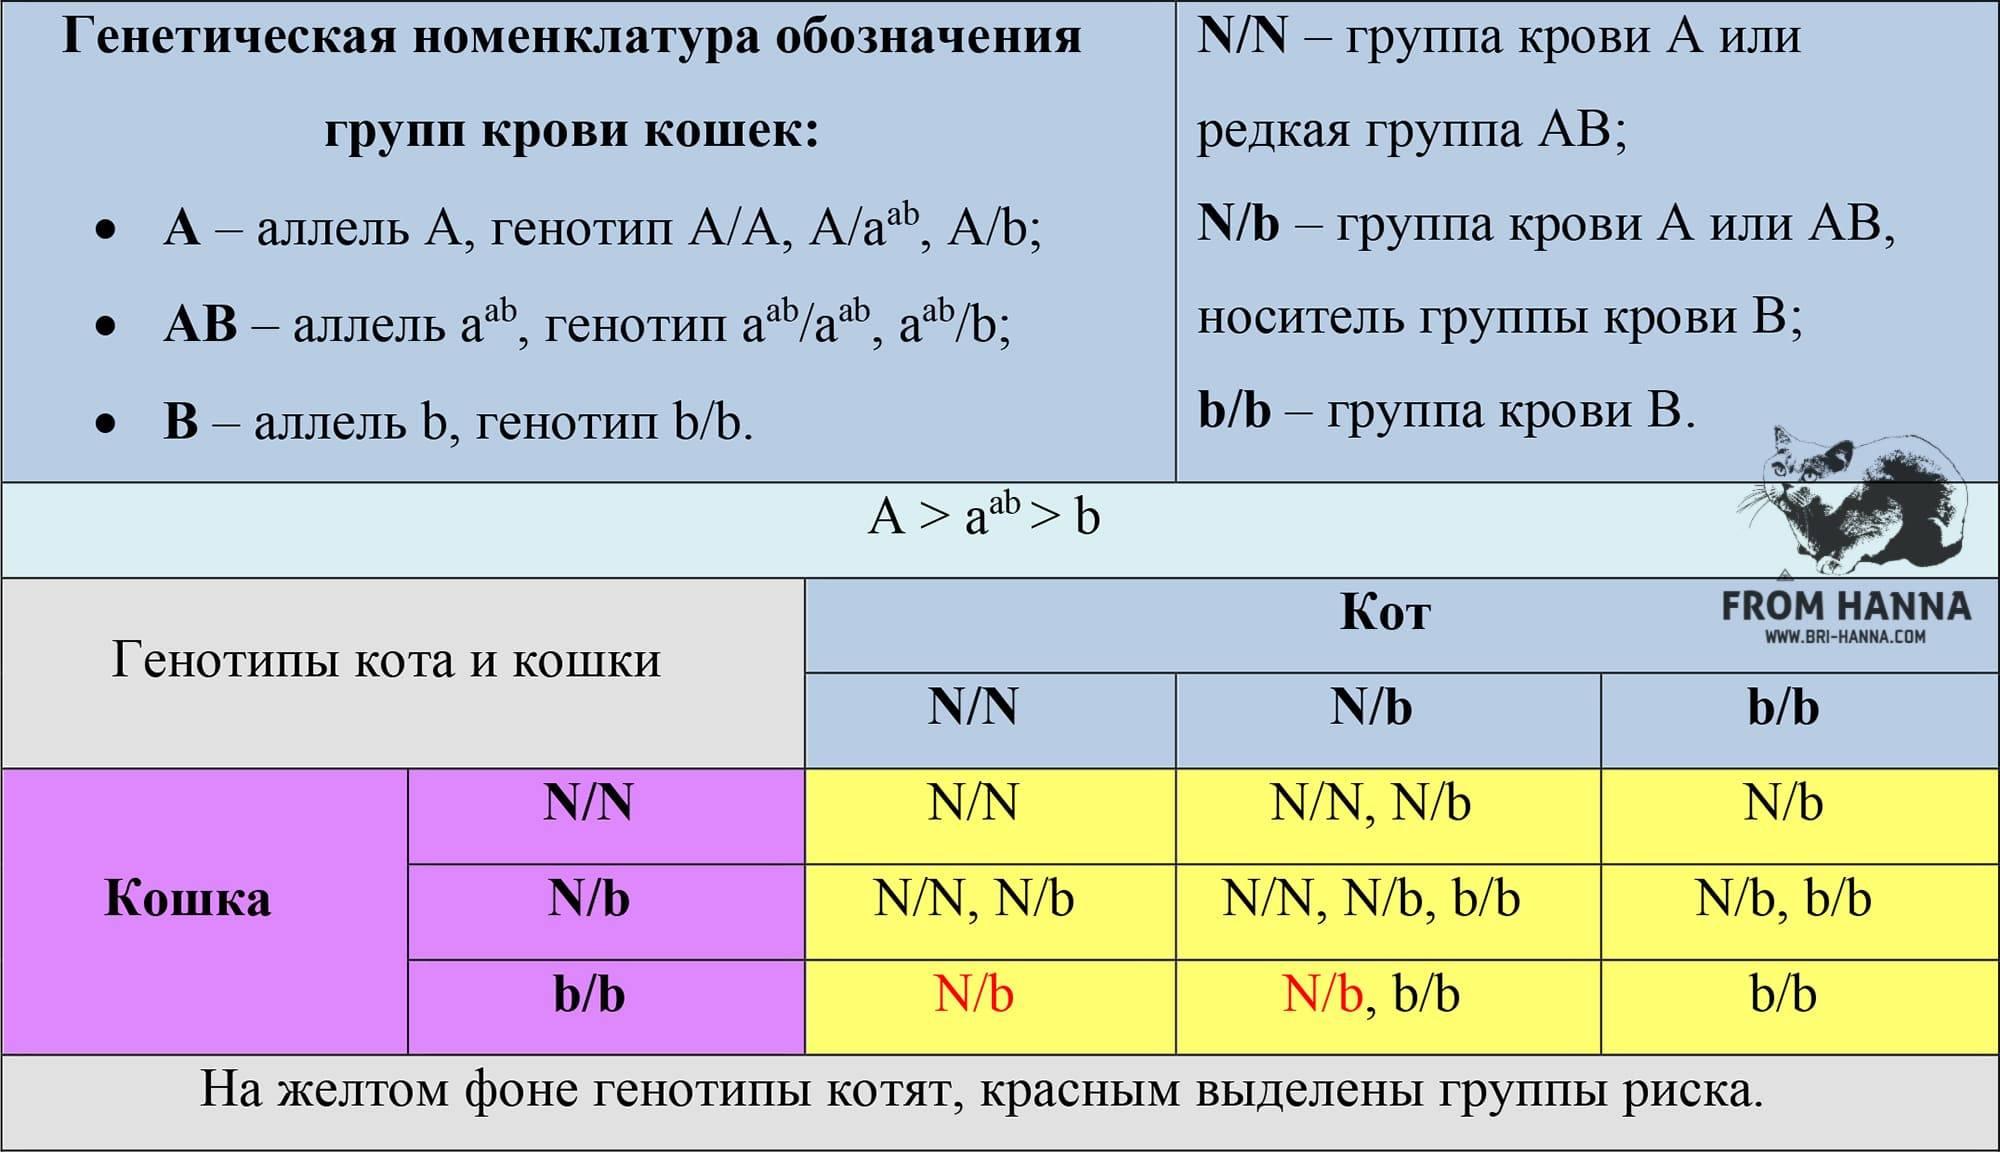 Сколько групп крови у кошек - kotiko.ru